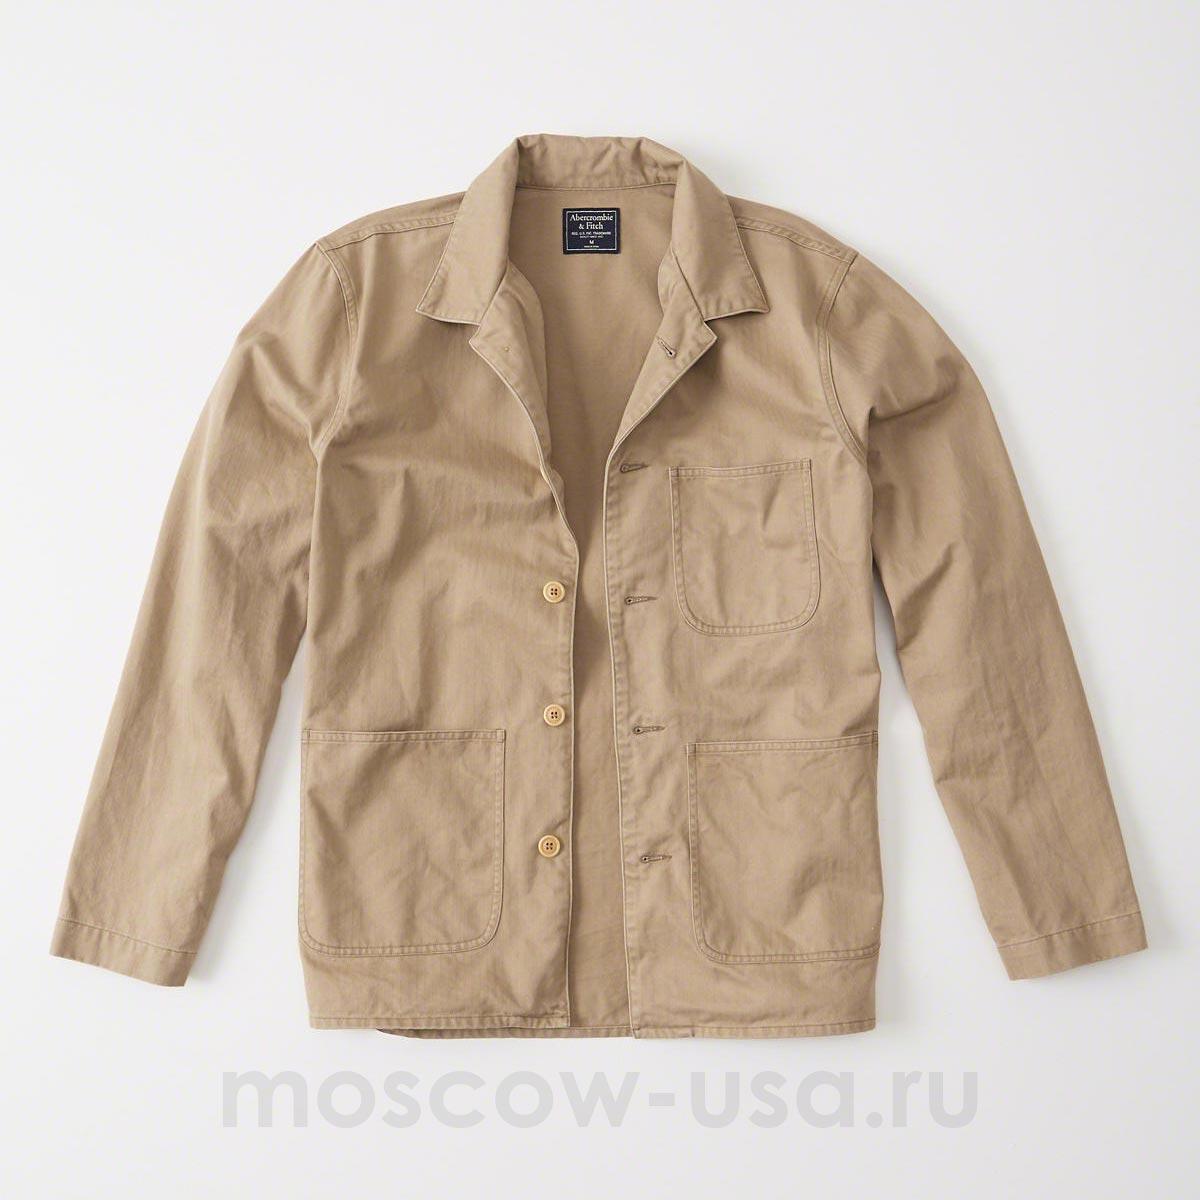 cf0aaab801e3742 Мужская рубашка-куртка Abercrombie Fitch бежевого цвета. Модель 03019 |  Купить в магазине Moscow USA